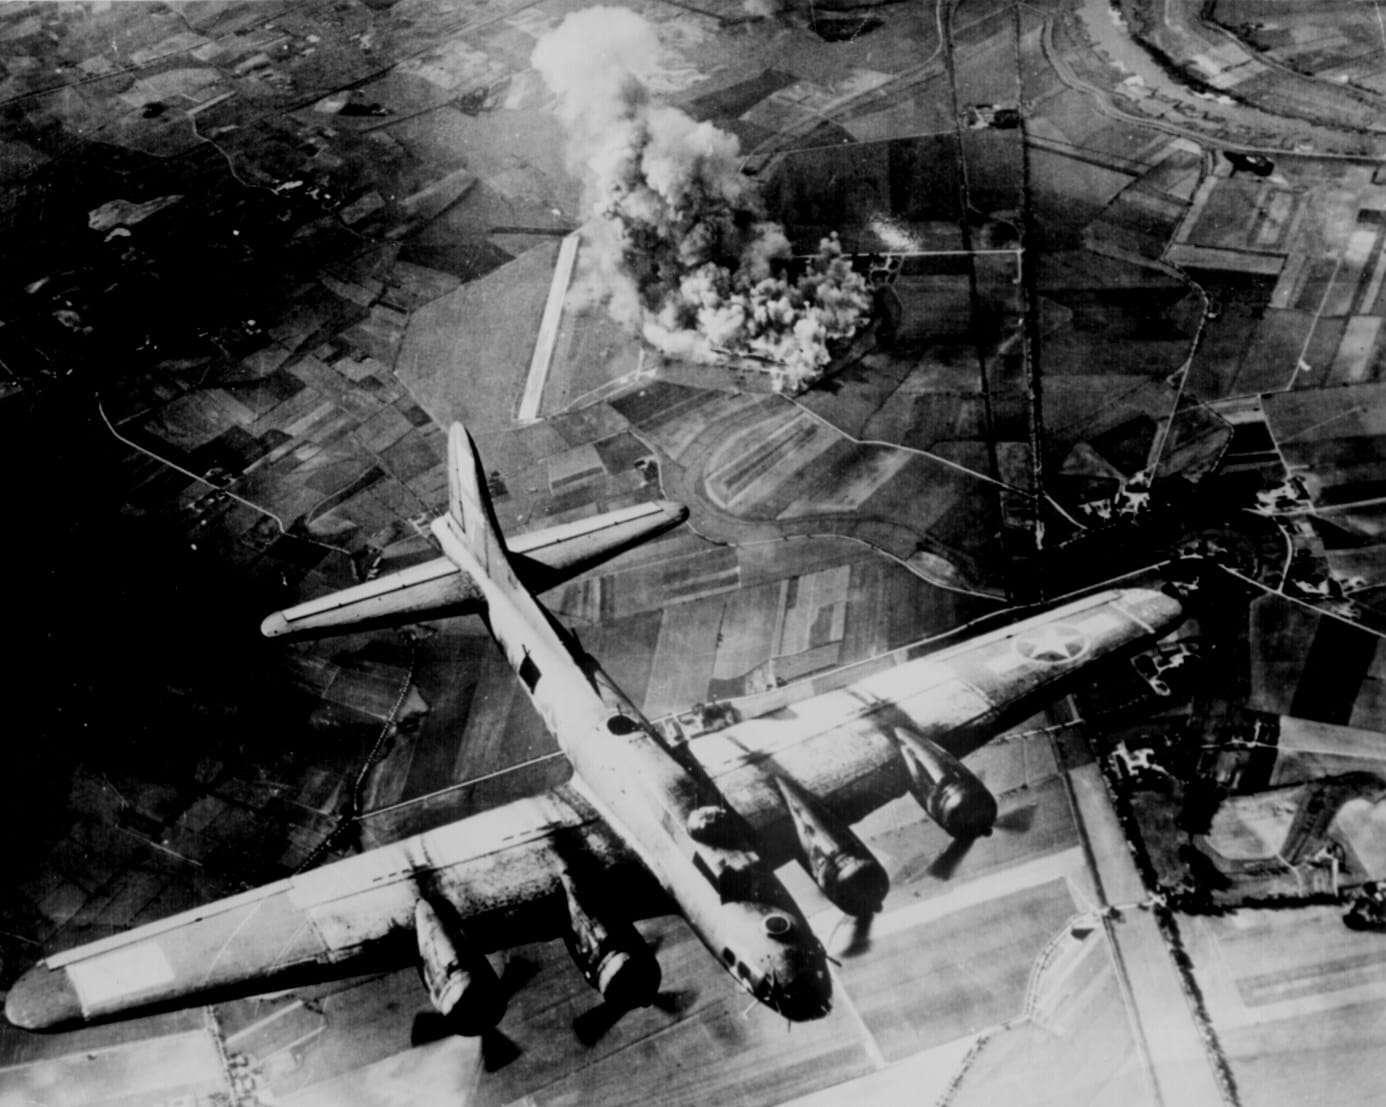 World War II Today: January 27 - B-17 over Wilhelmshaven